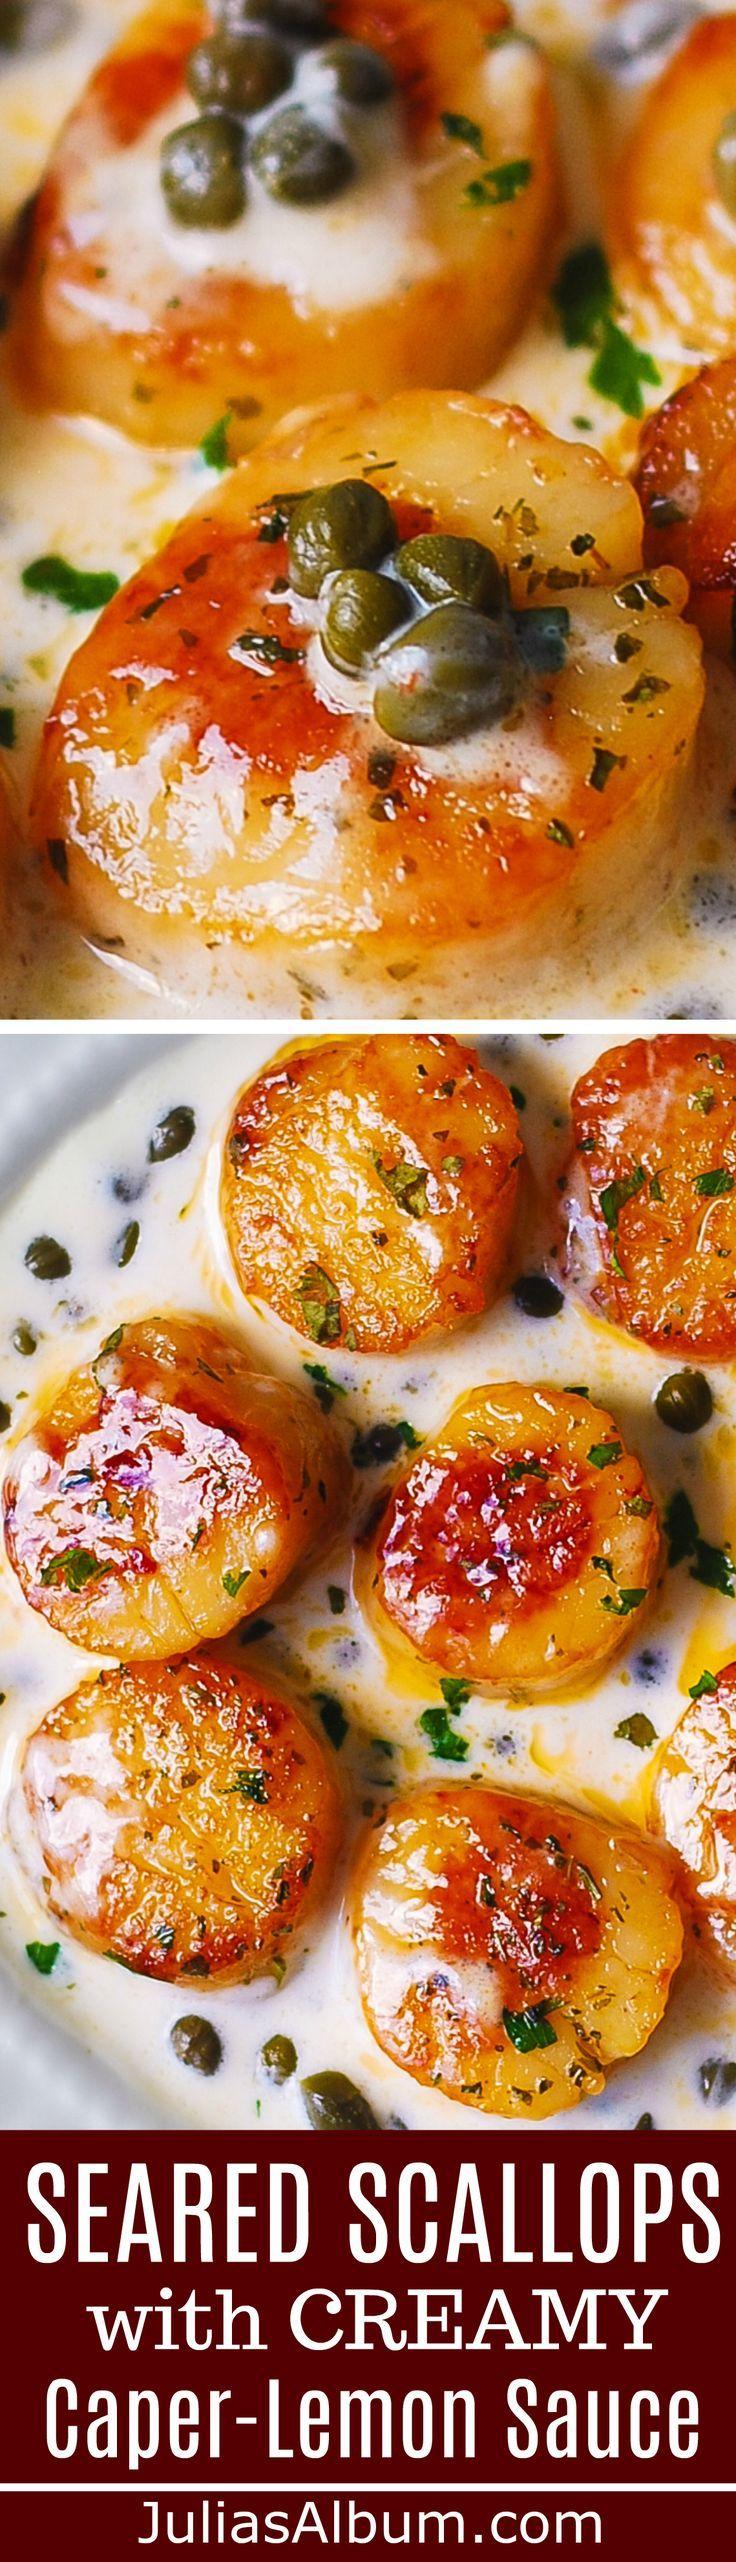 Seared Scallops with Creamy Caper-Lemon Sauce #seafood #shellfish #dinner